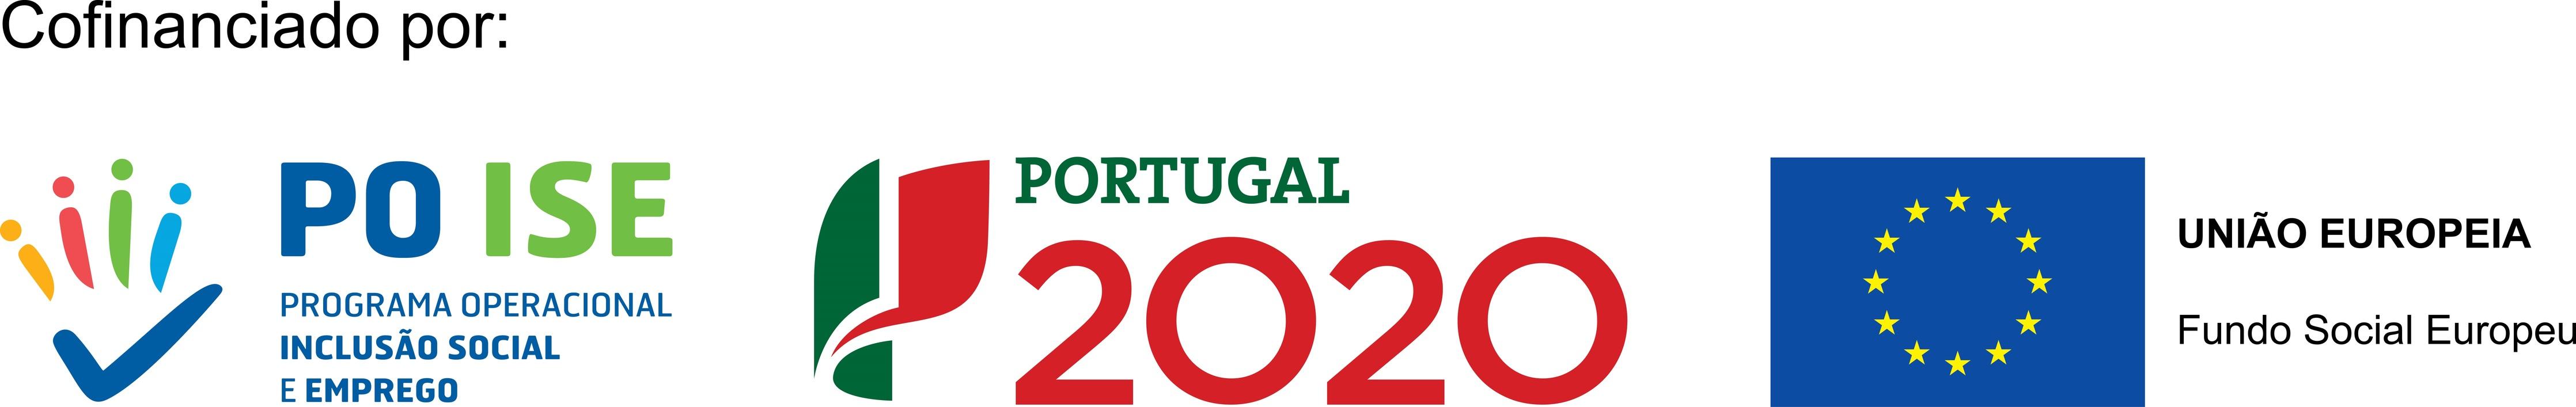 hospital-de-braga-2019